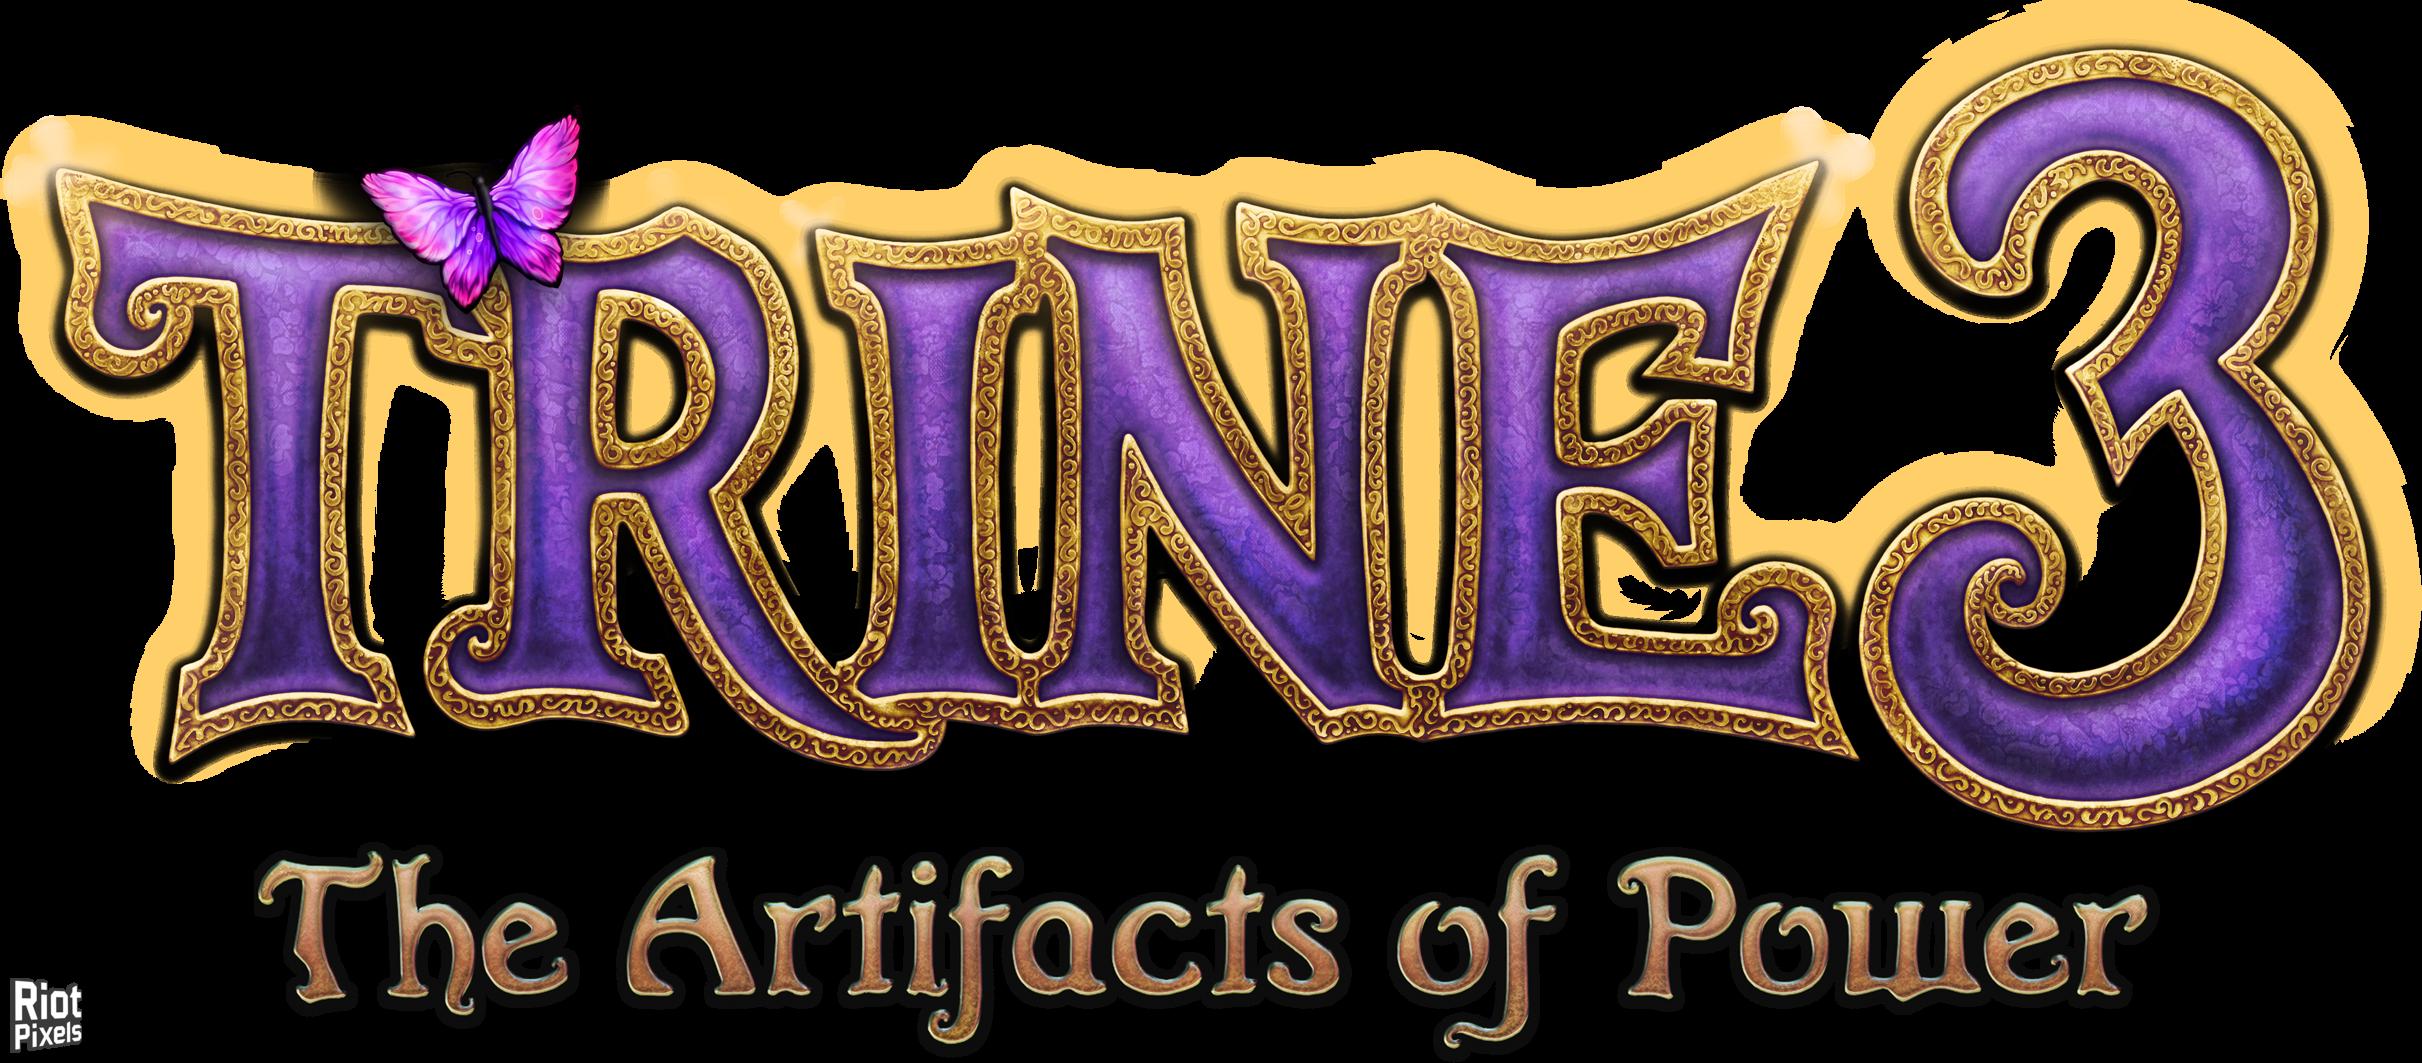 Trine 3 The Artifacts of Power Game logo, Game logo